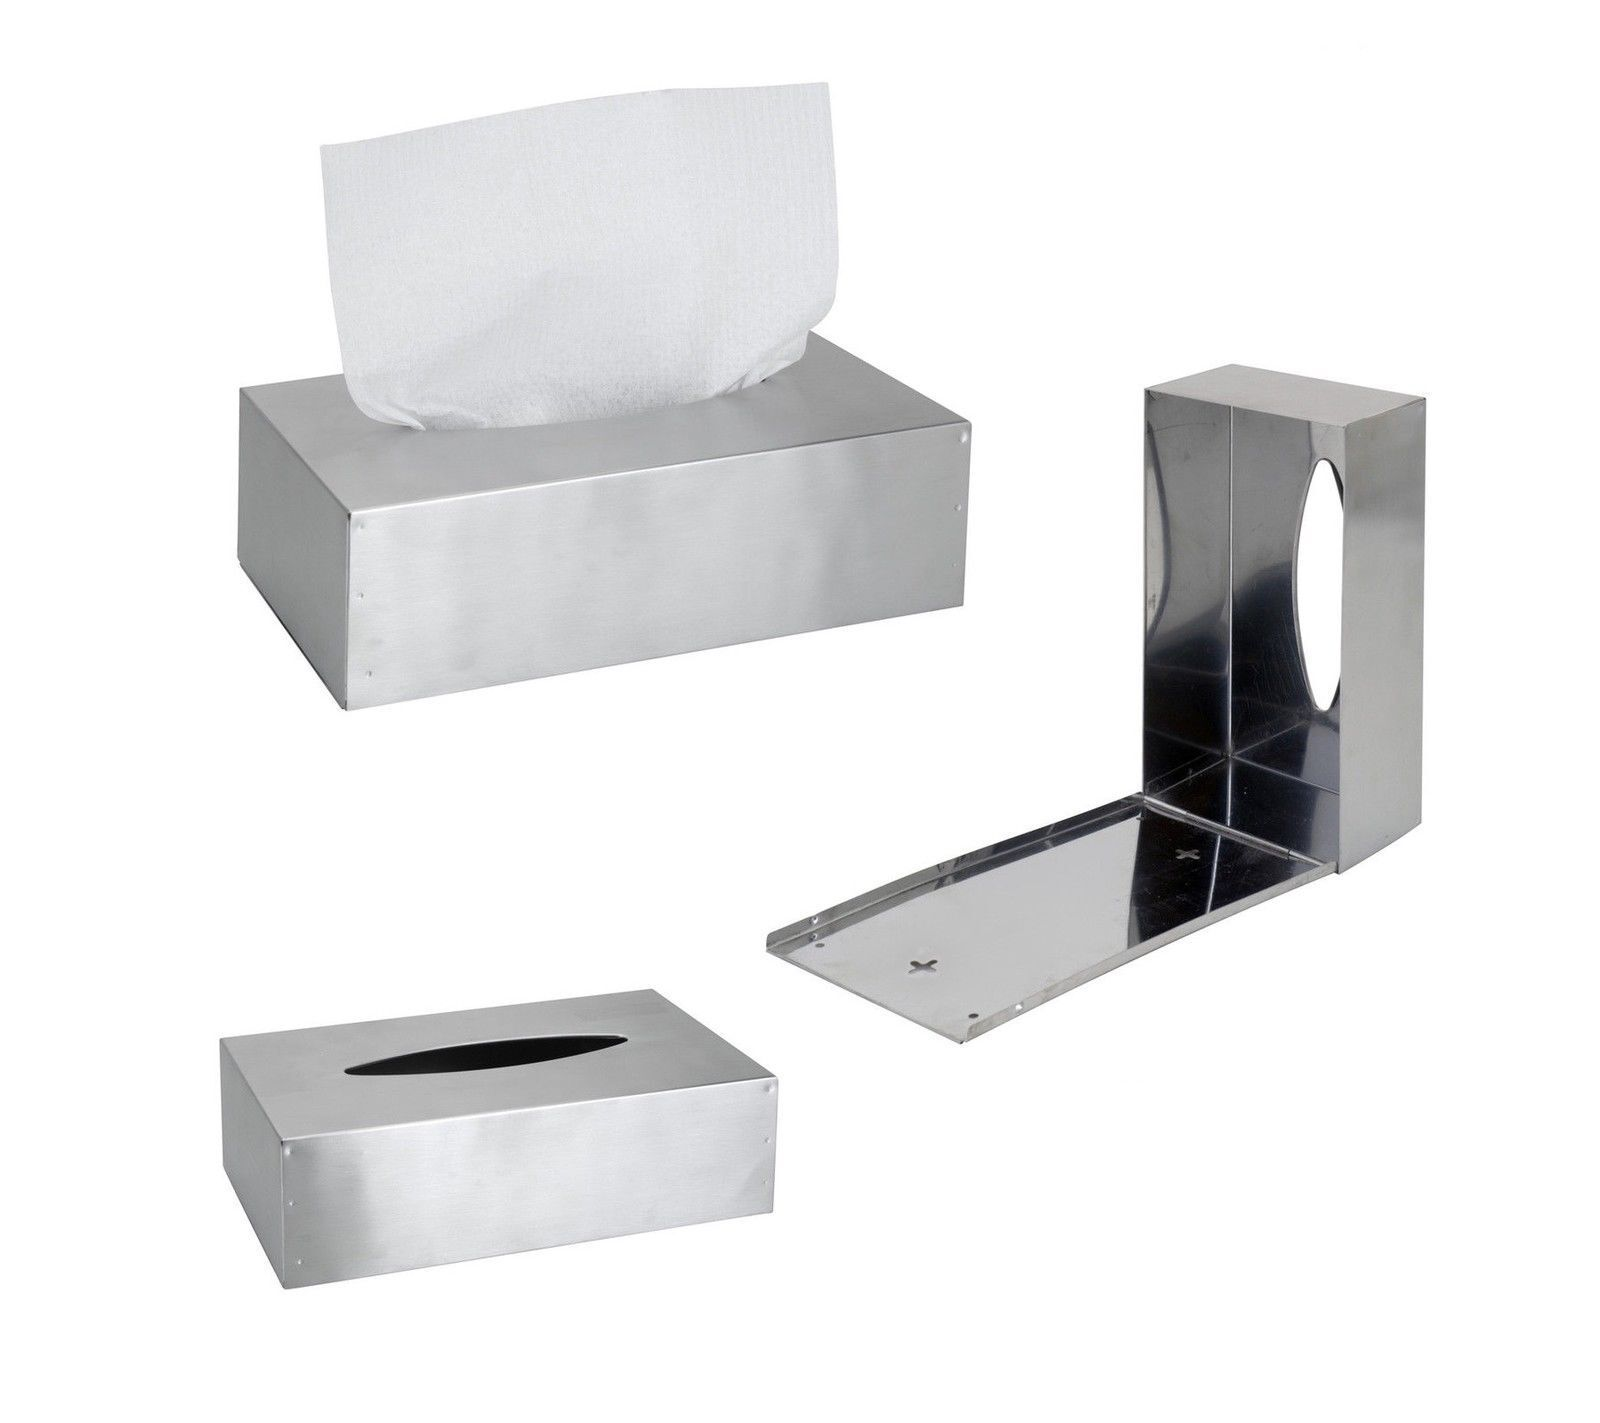 Kosmetiktücherbox Edelstahl Taschentuchspender Taschentuchbox Edelstahlbox